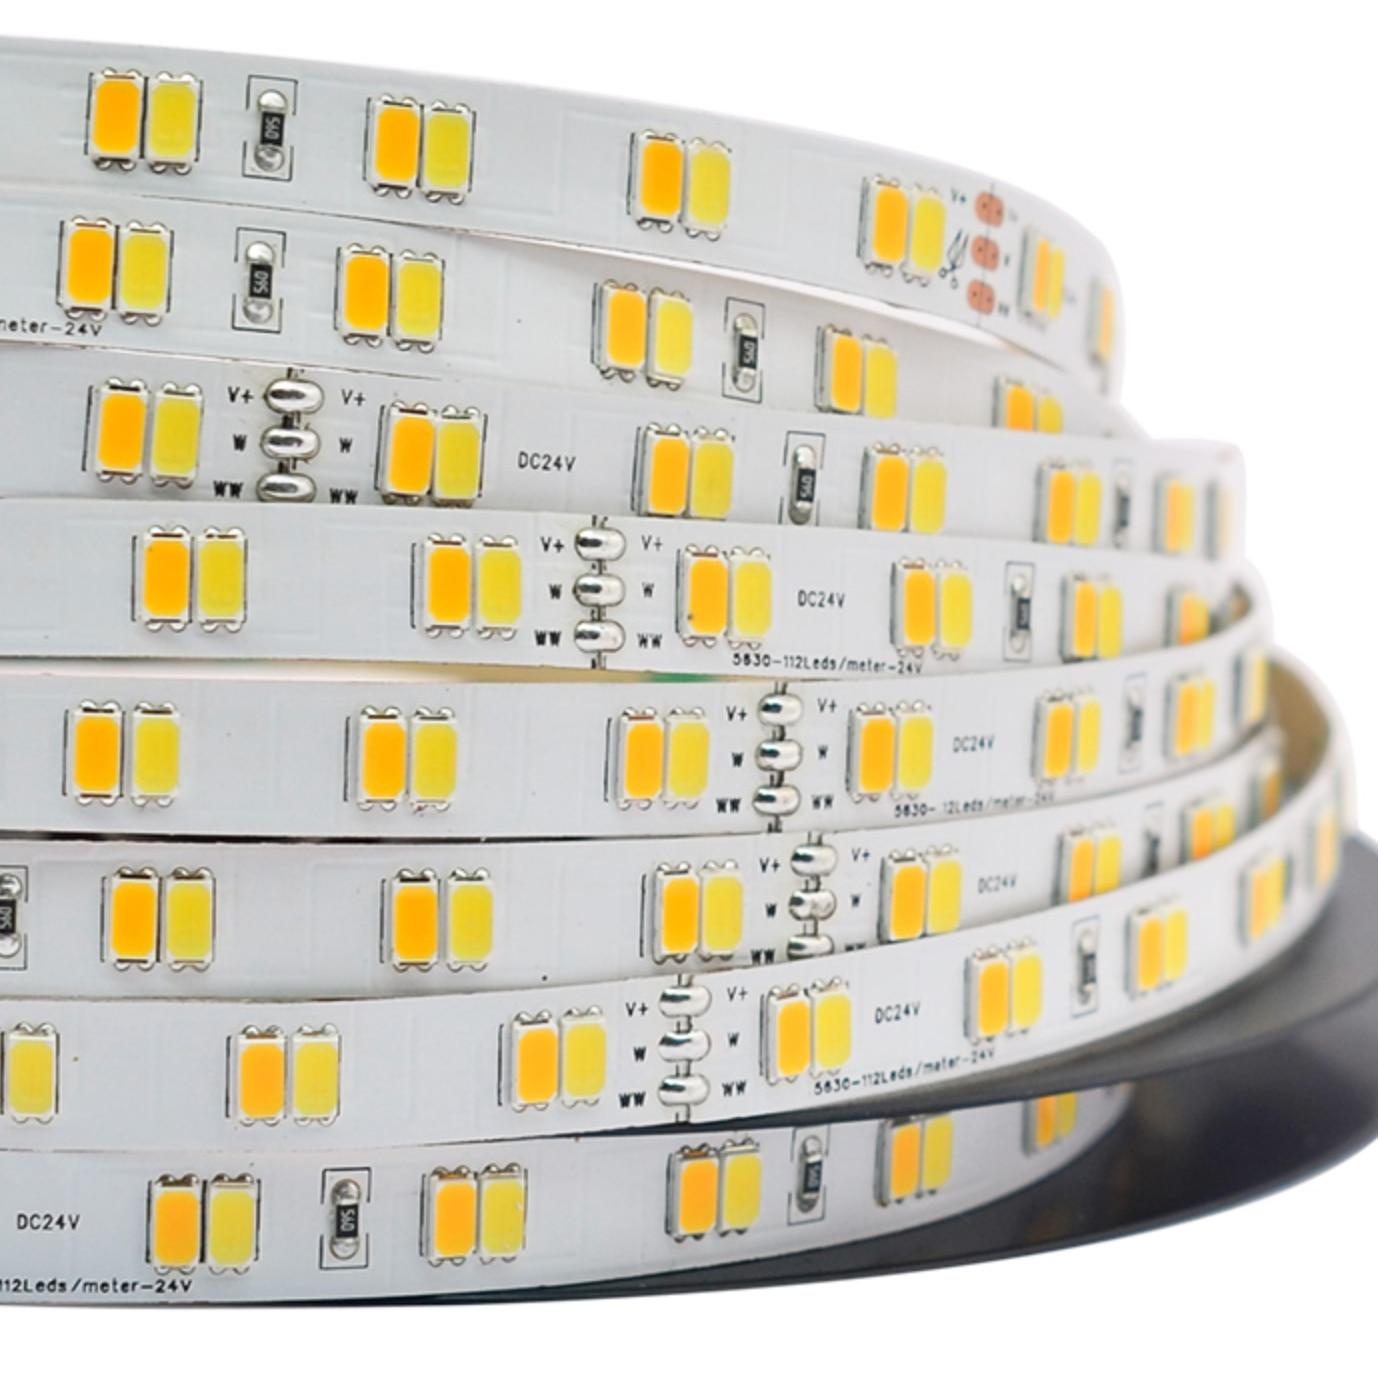 24V DC, 112led/m Smd 5630 (560led/5m) Led Strip Light, CW+WW CCT Adjustable